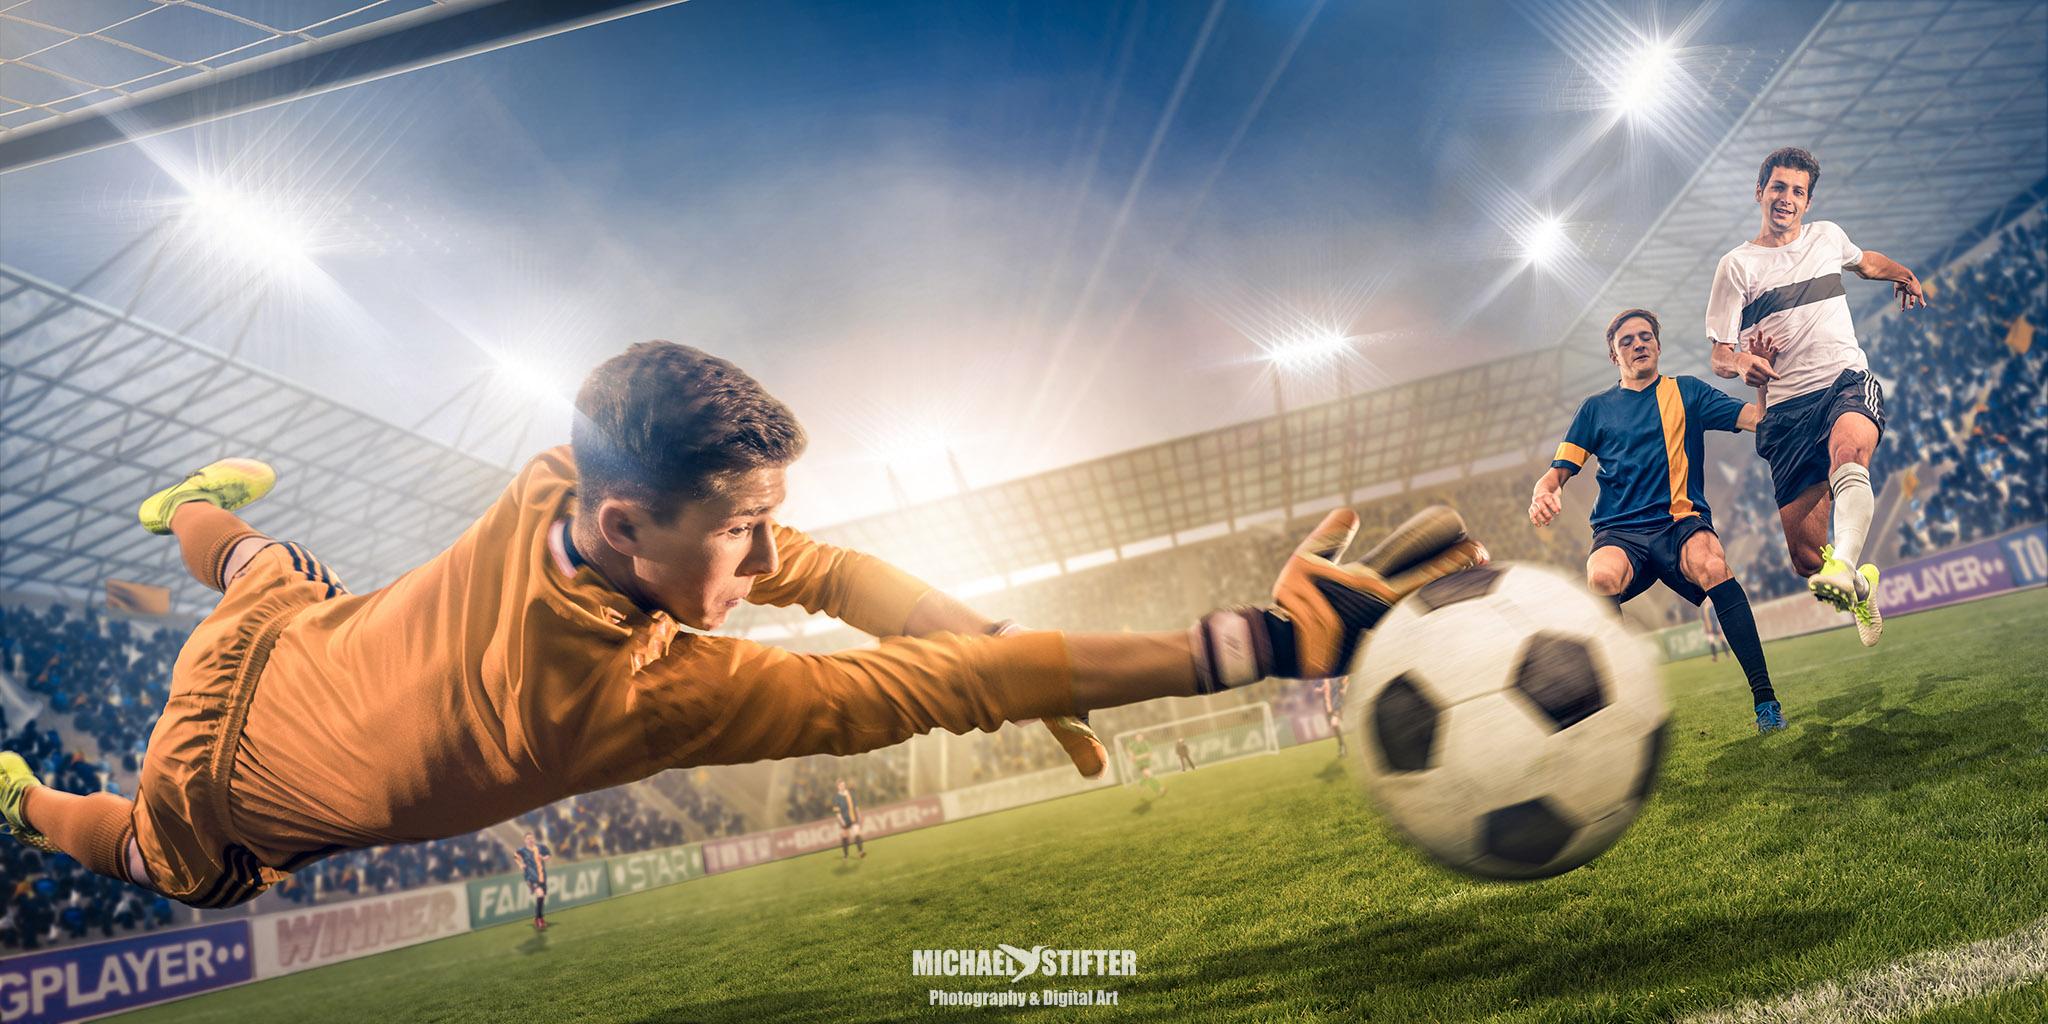 fussball  sturm auf's tor foto  bild  fotomontage